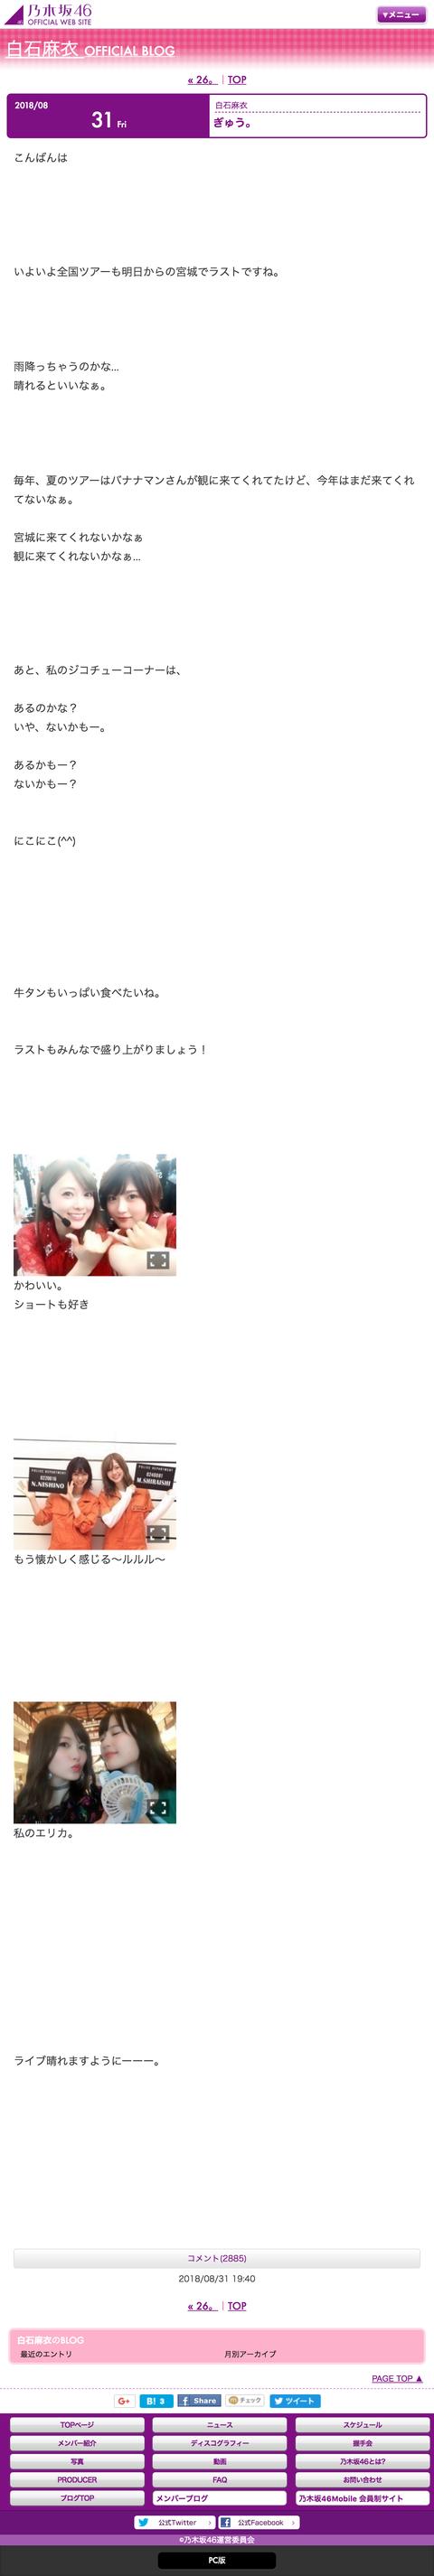 blog.nogizaka46.com_mai.shiraishi_smph_2018_08_046580